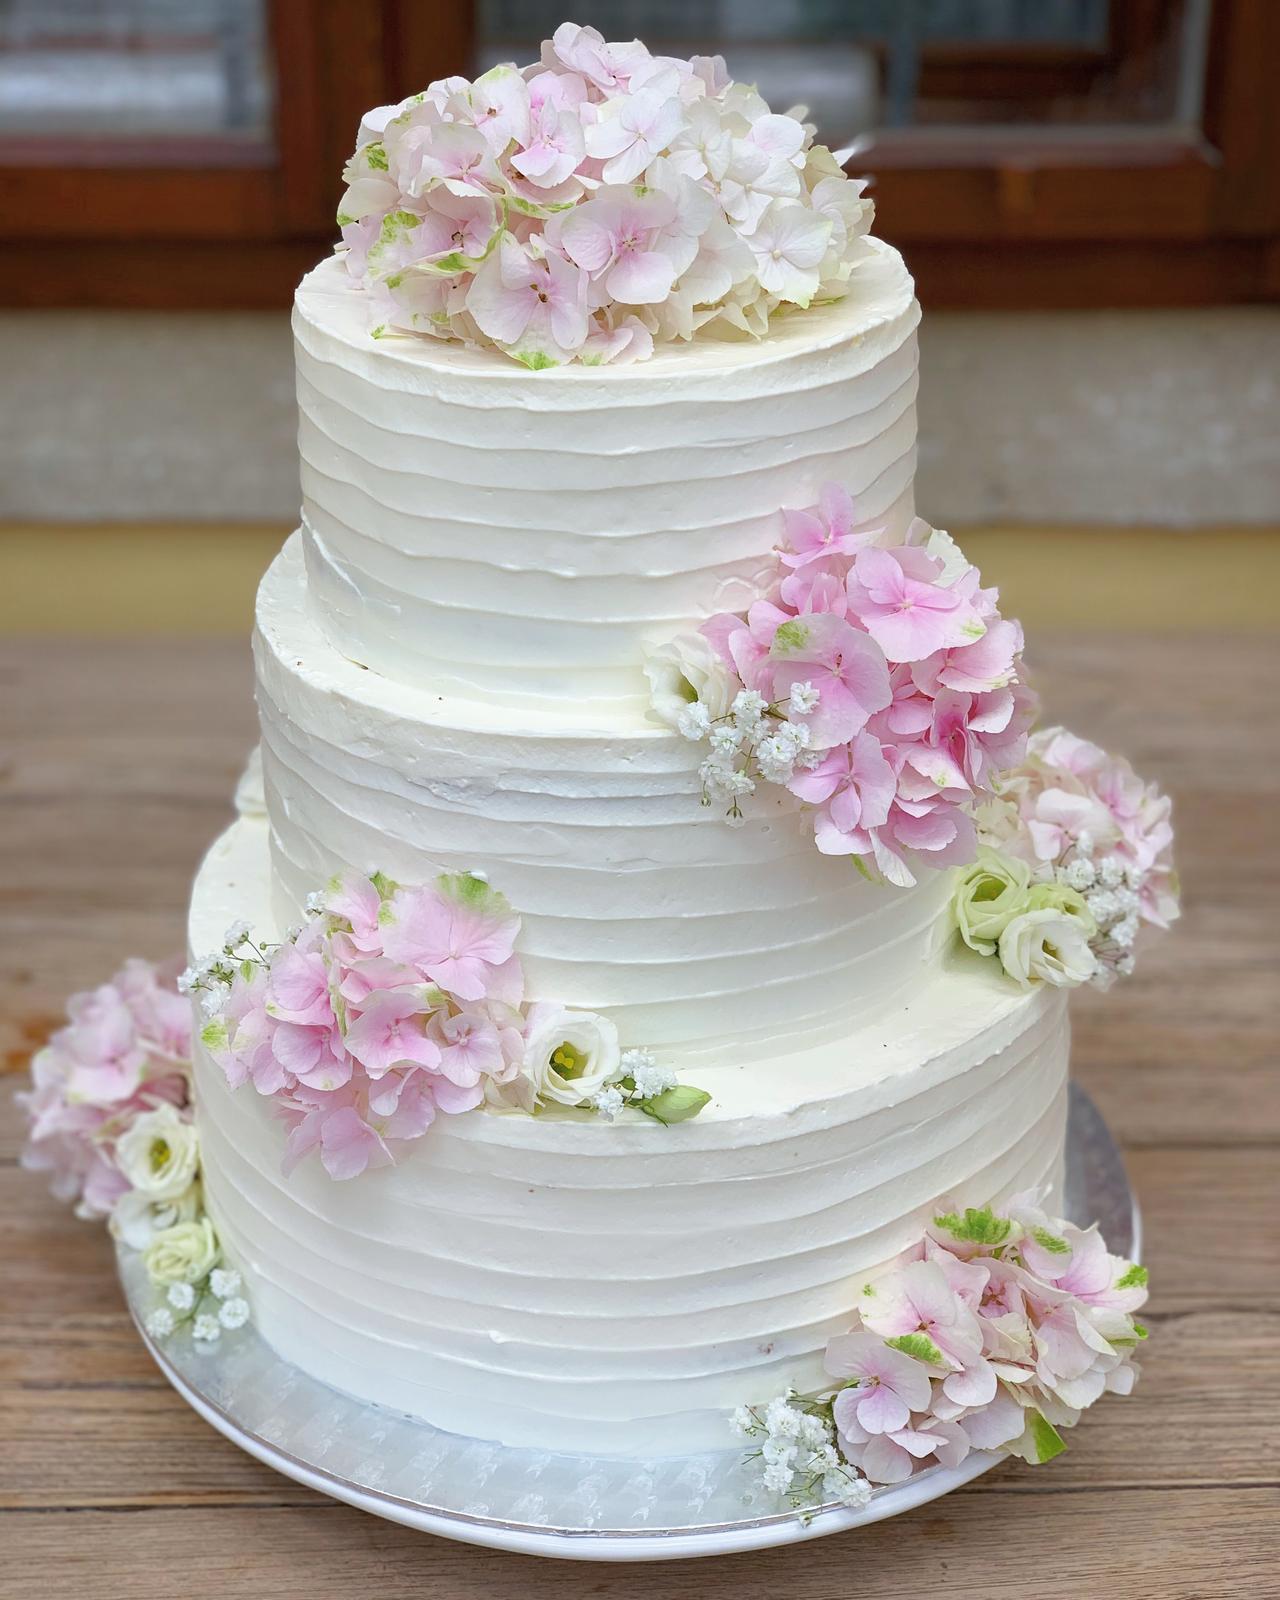 Svadobné torty - Realizácia: www.castel.sk